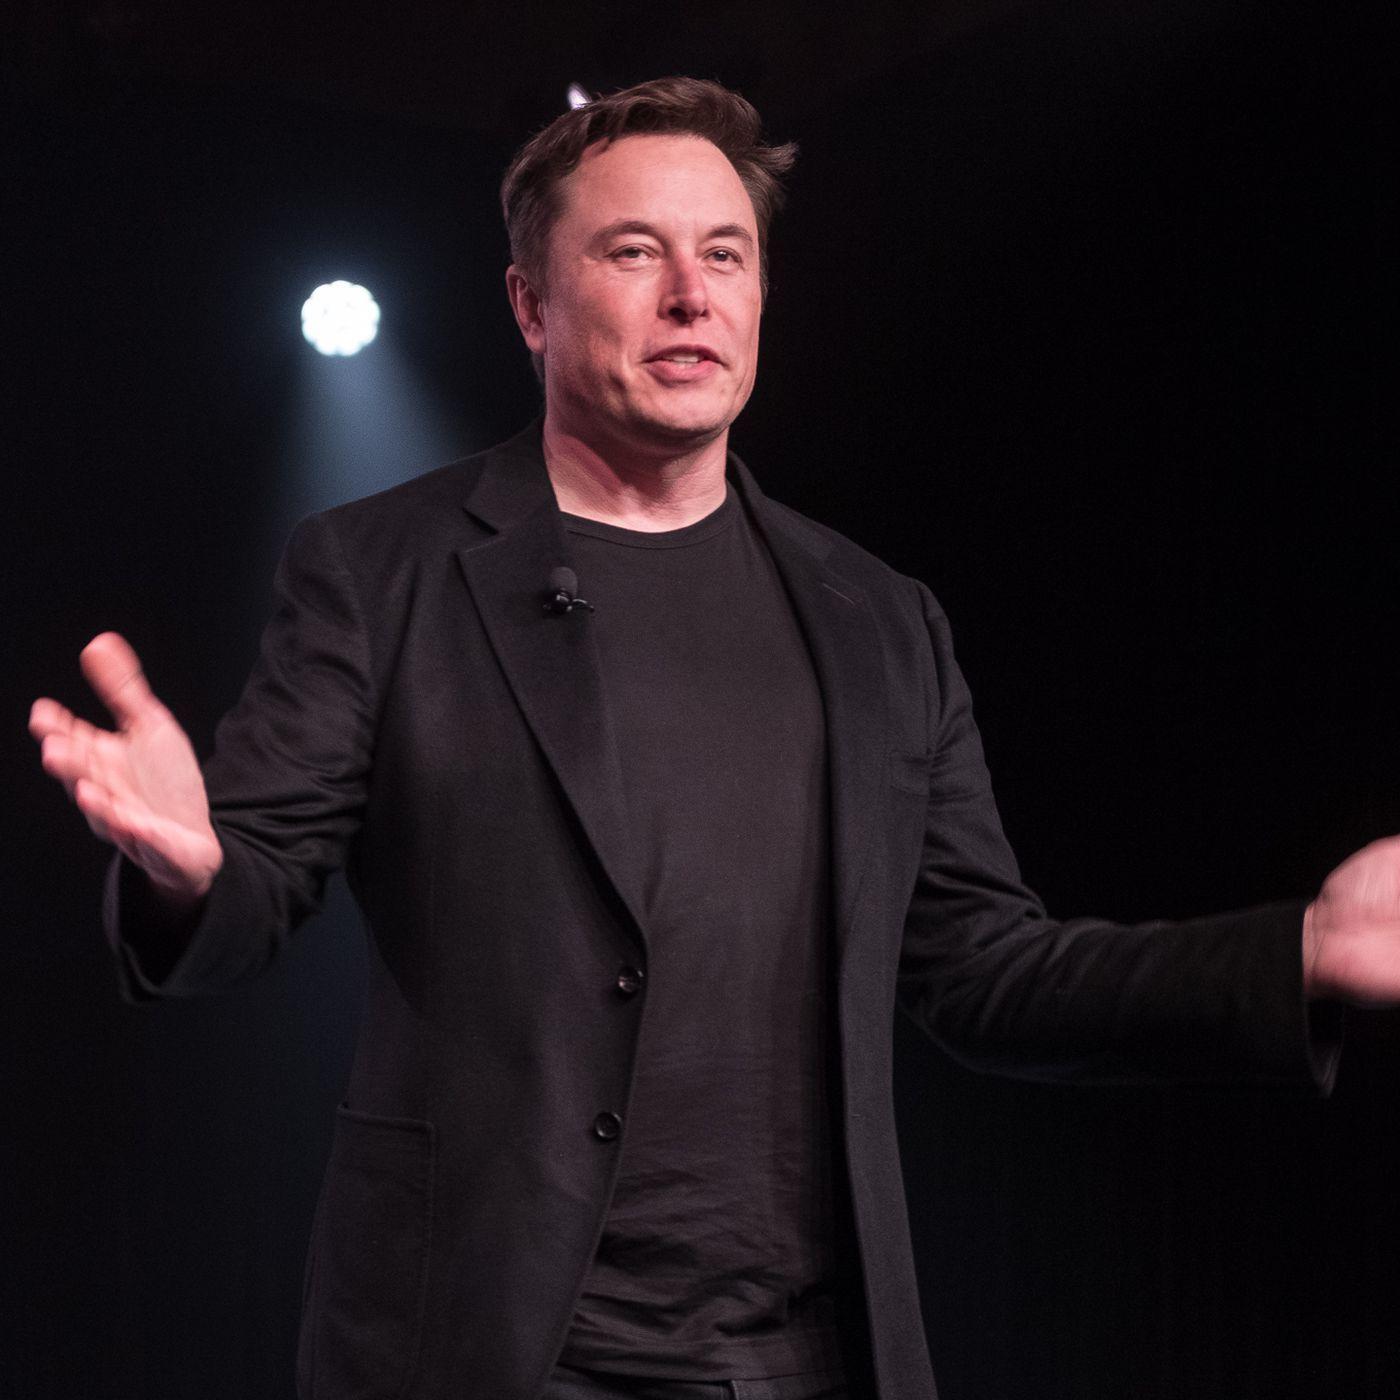 Elon Musk S Neuralink Will Let The Public Stream Music Directly To Their Brain In 2020 Elon Musk Elon Elon Musk Book